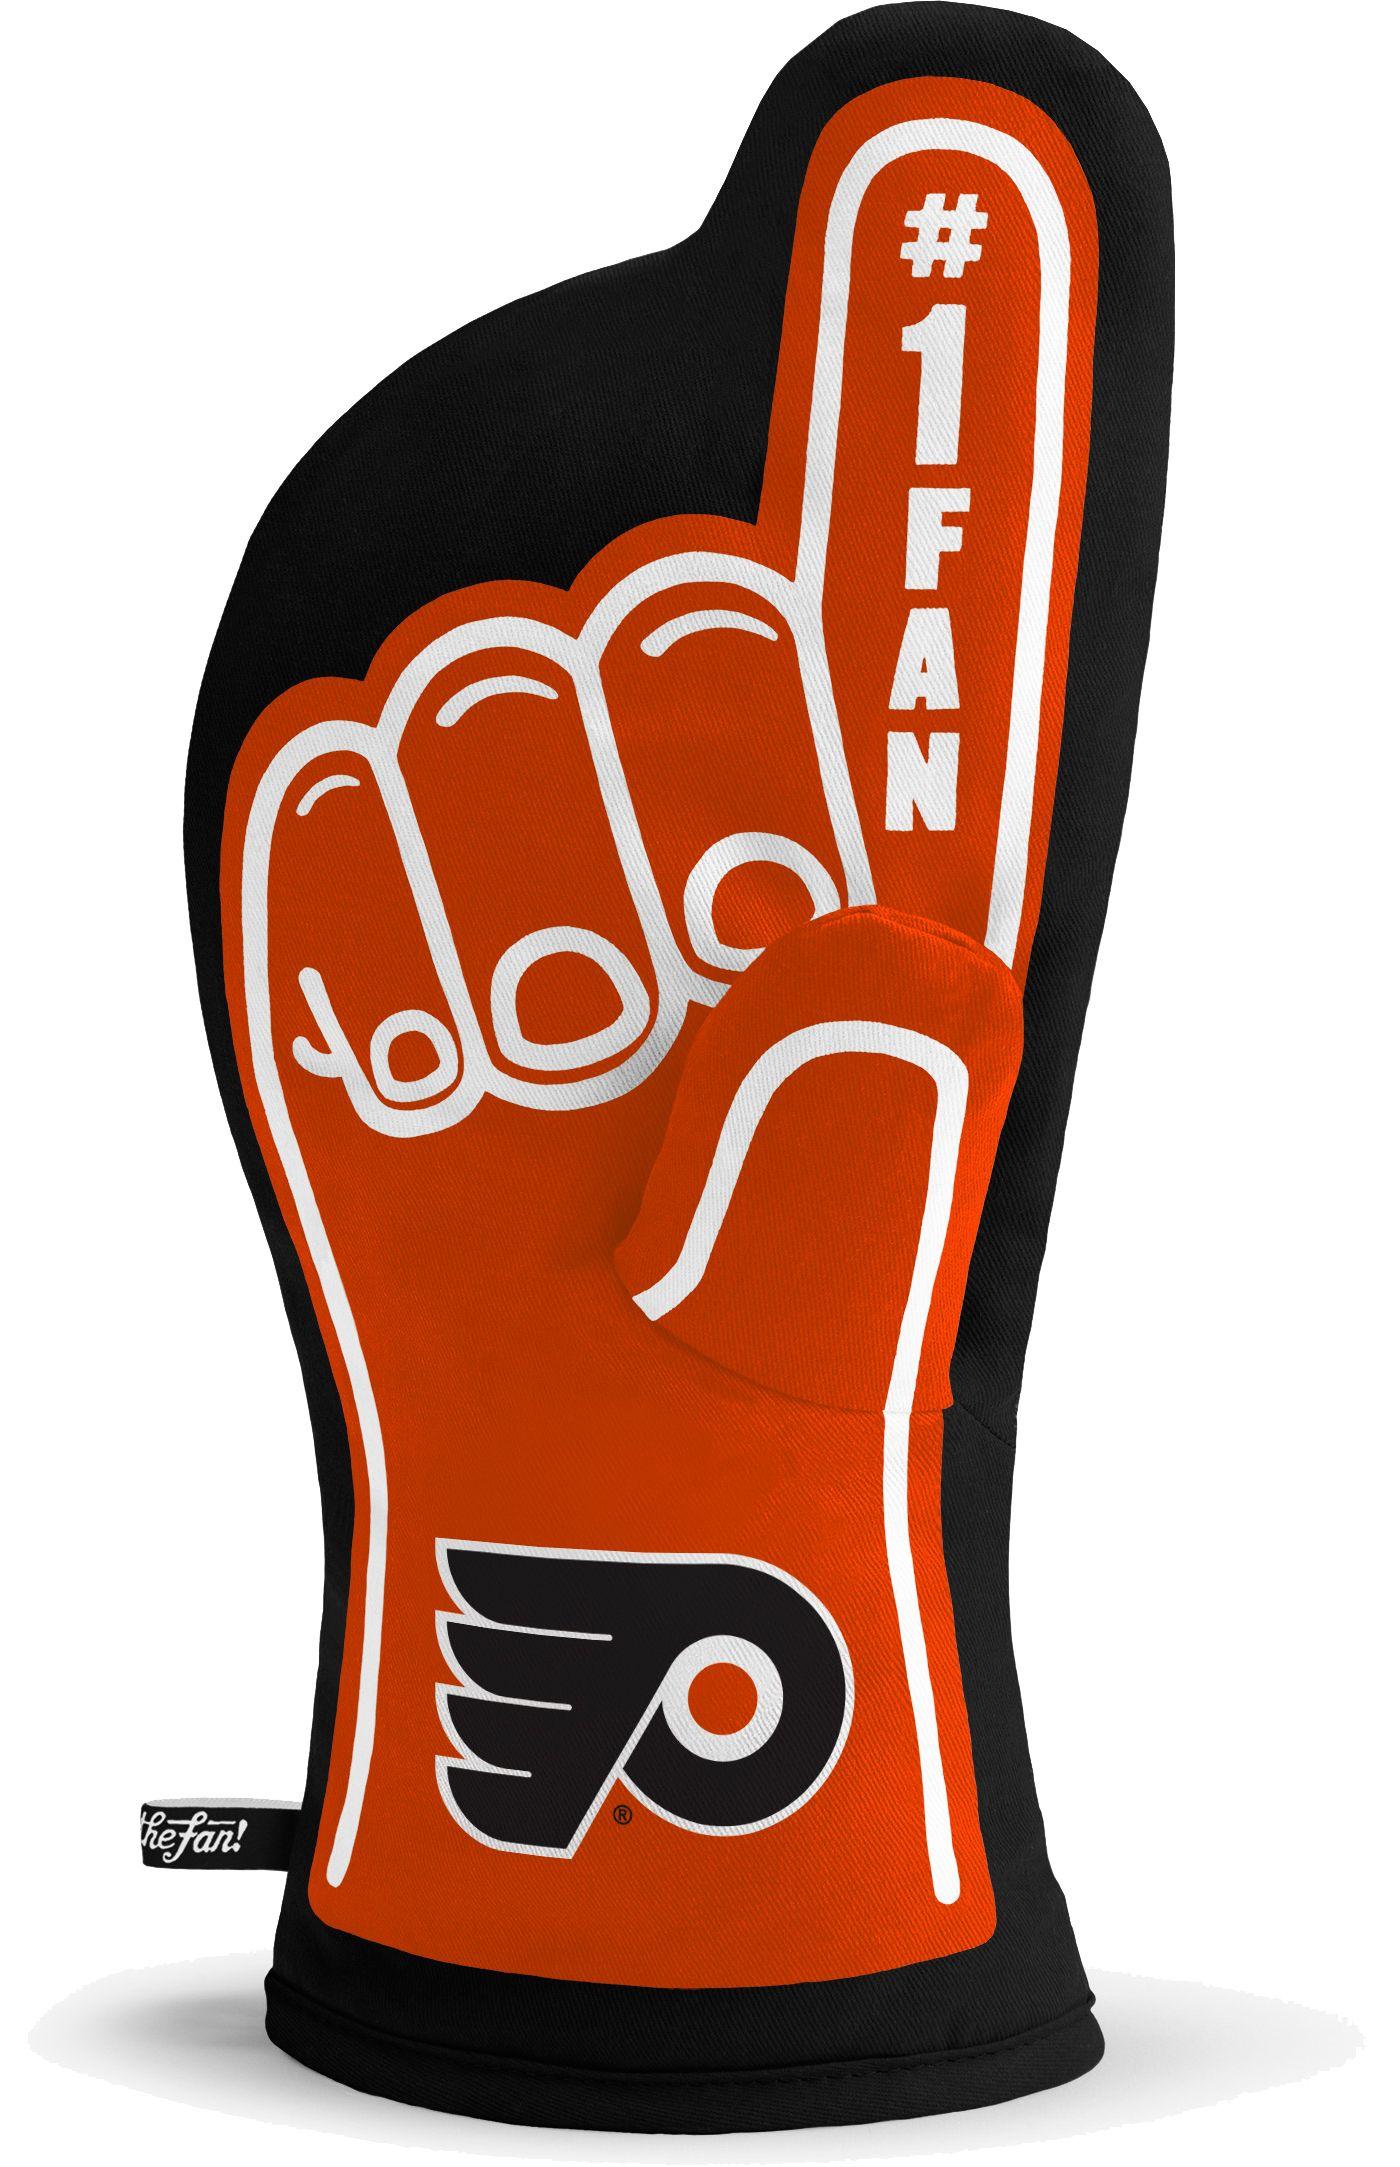 You The Fan Philadelphia Flyers #1 Oven Mitt